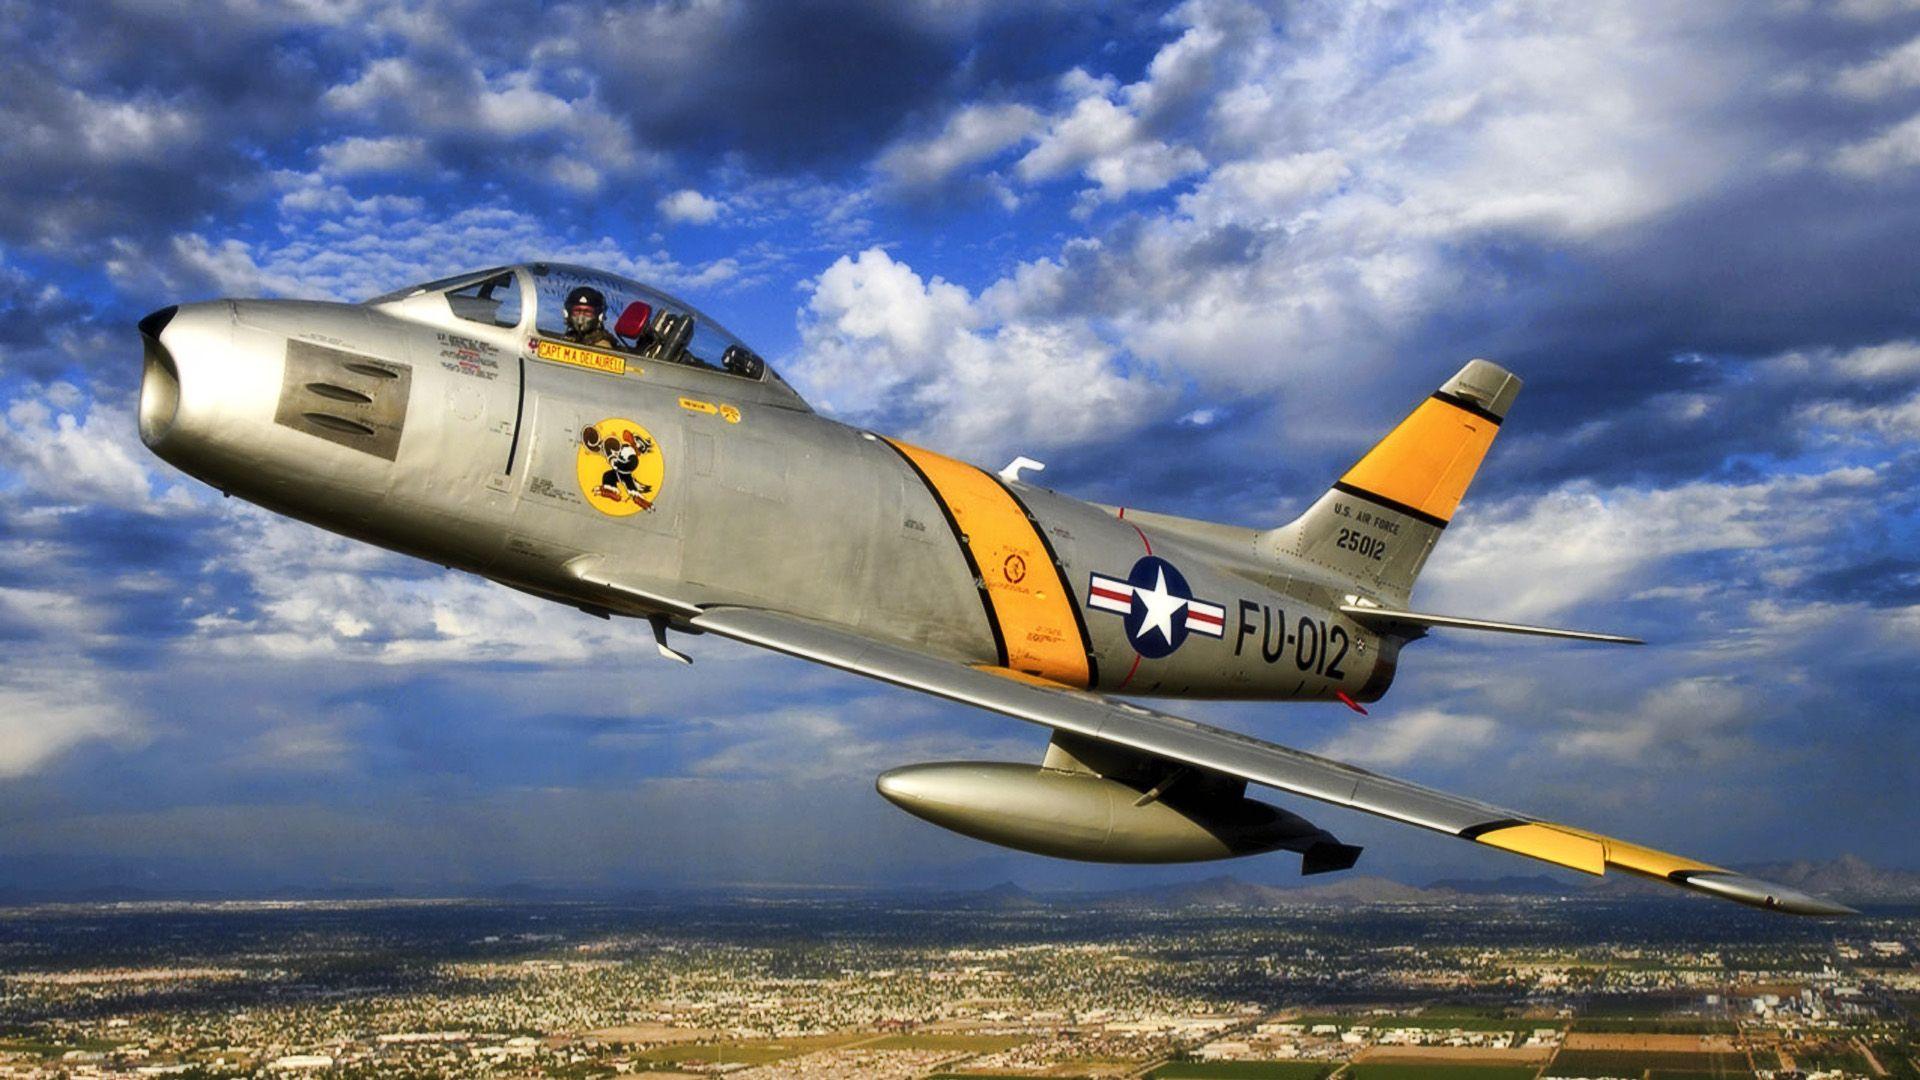 Обои painting, ww2, jet, Airplane, aviation, North american f-86d sabre, war, jet. Авиация foto 11